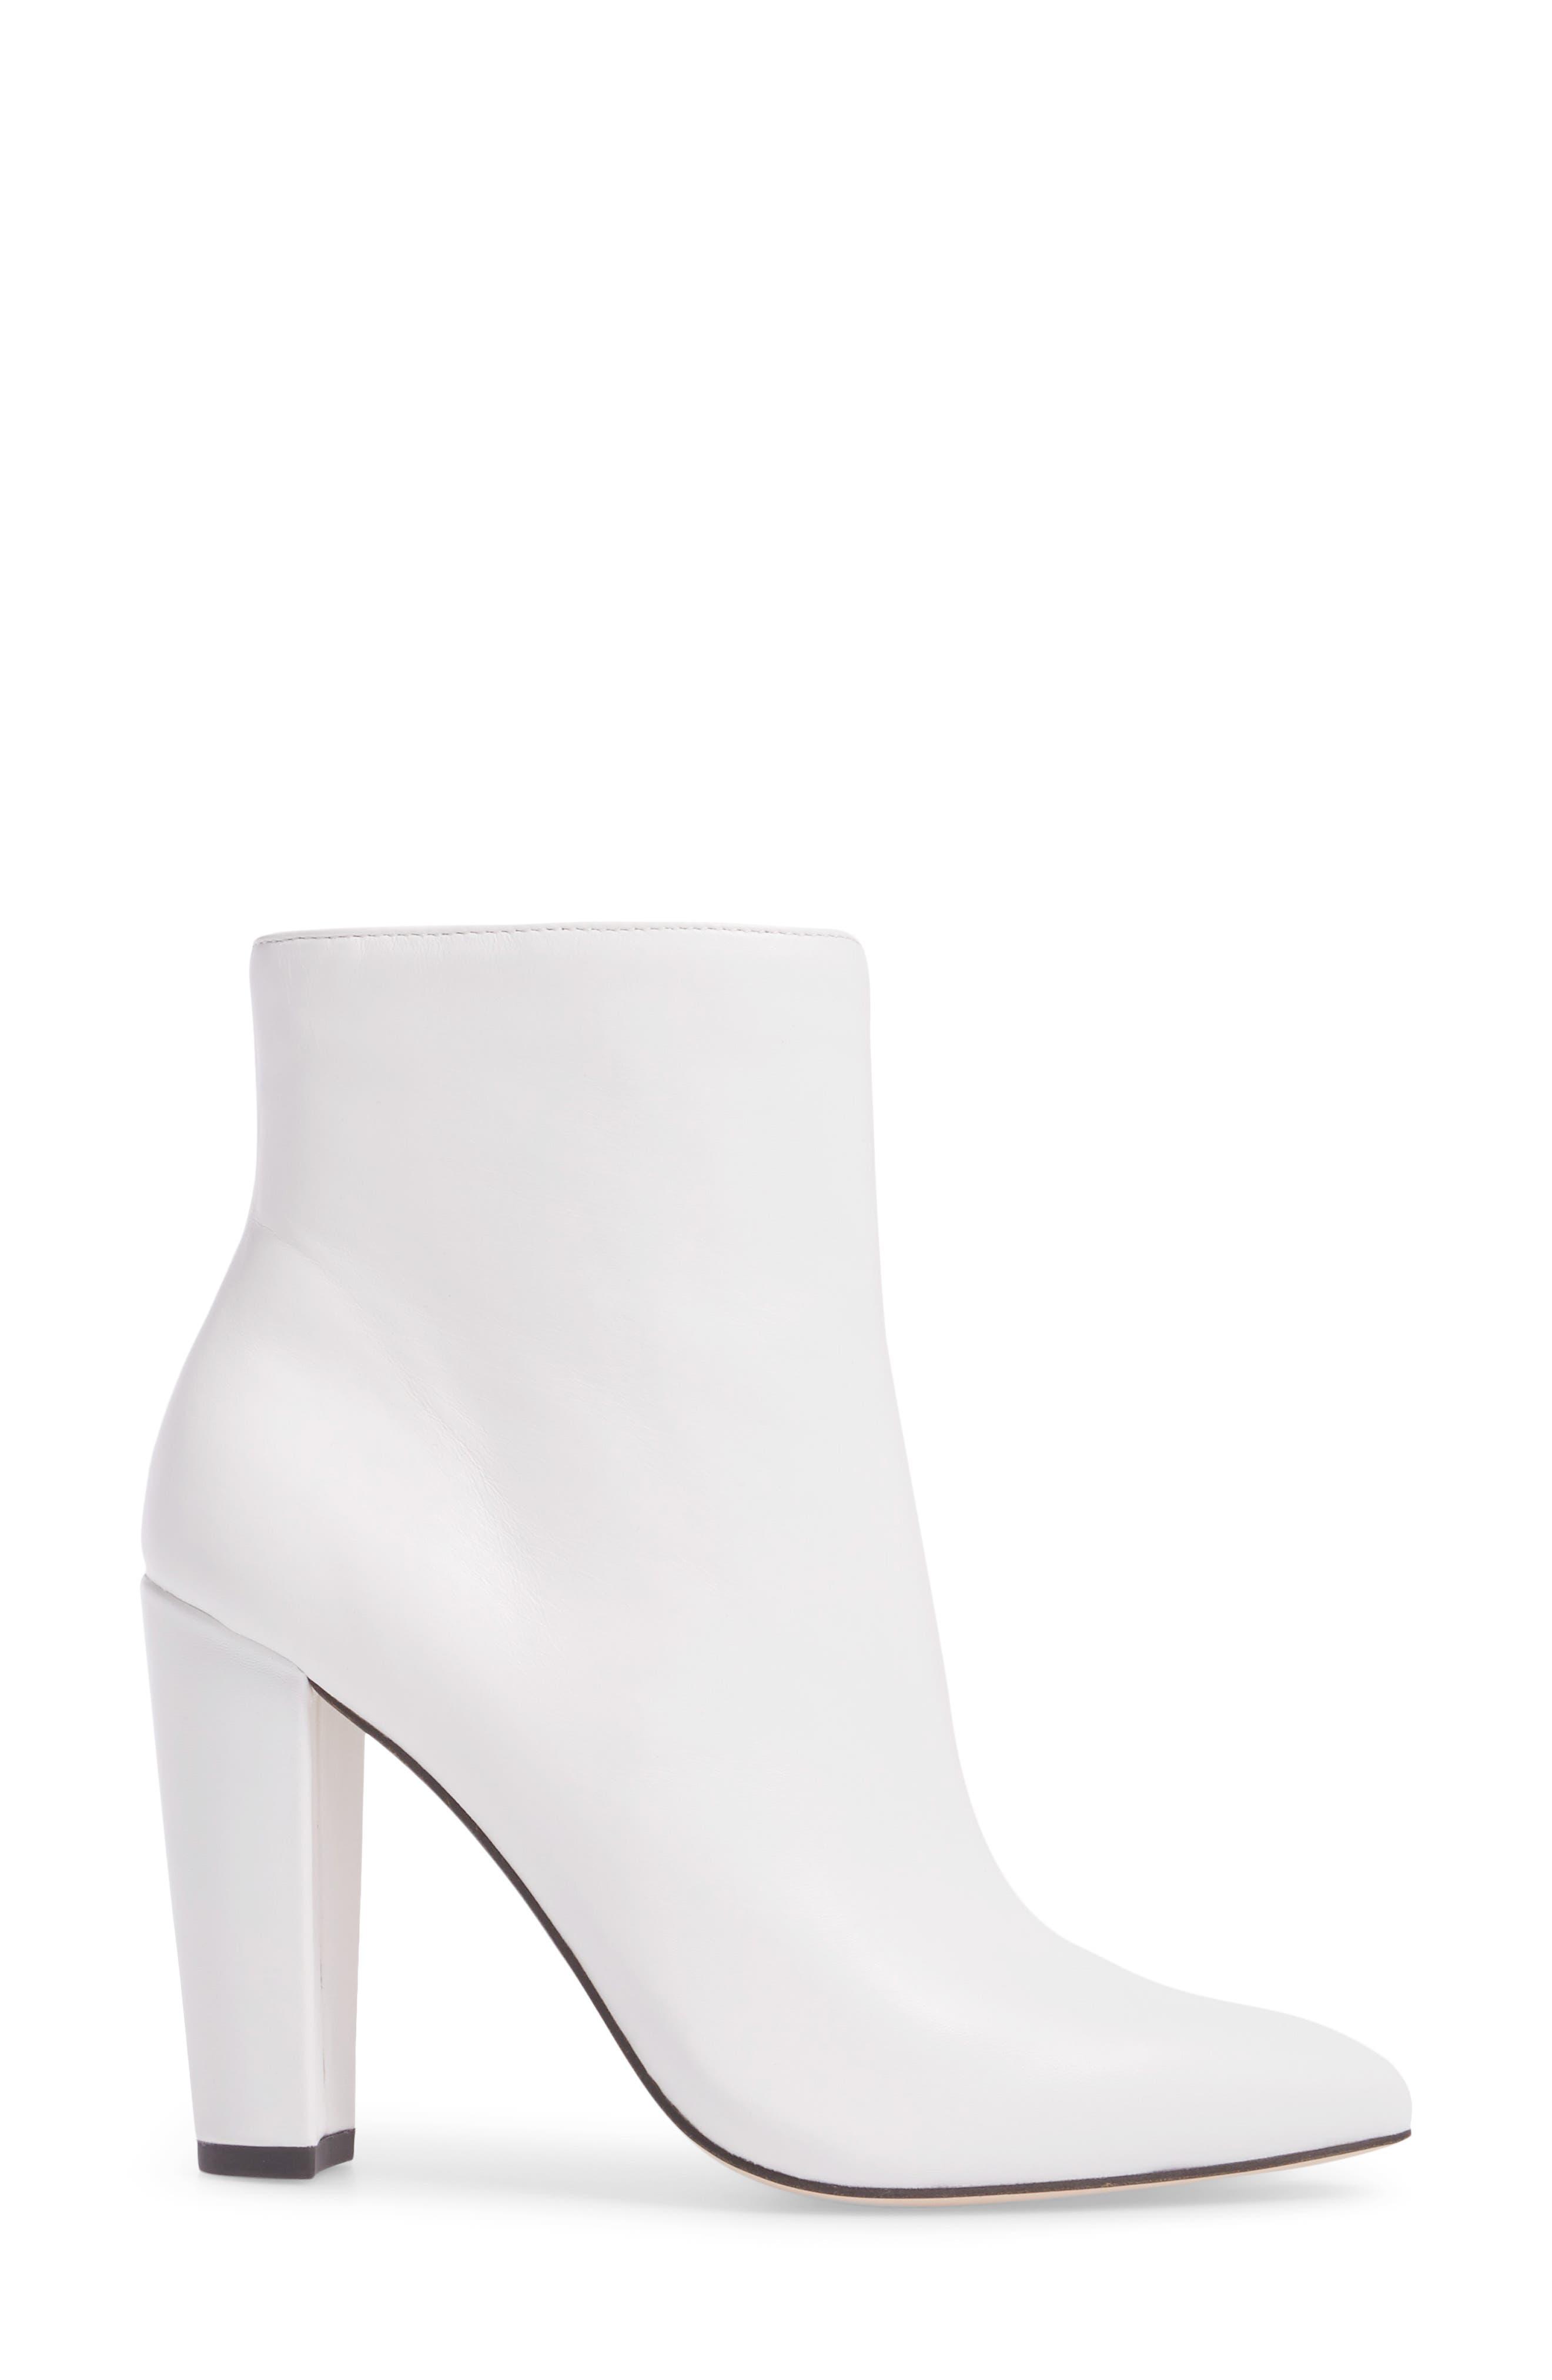 Alternate Image 3  - Jessica Simpson Teddi Crescent-Heel Bootie (Women)